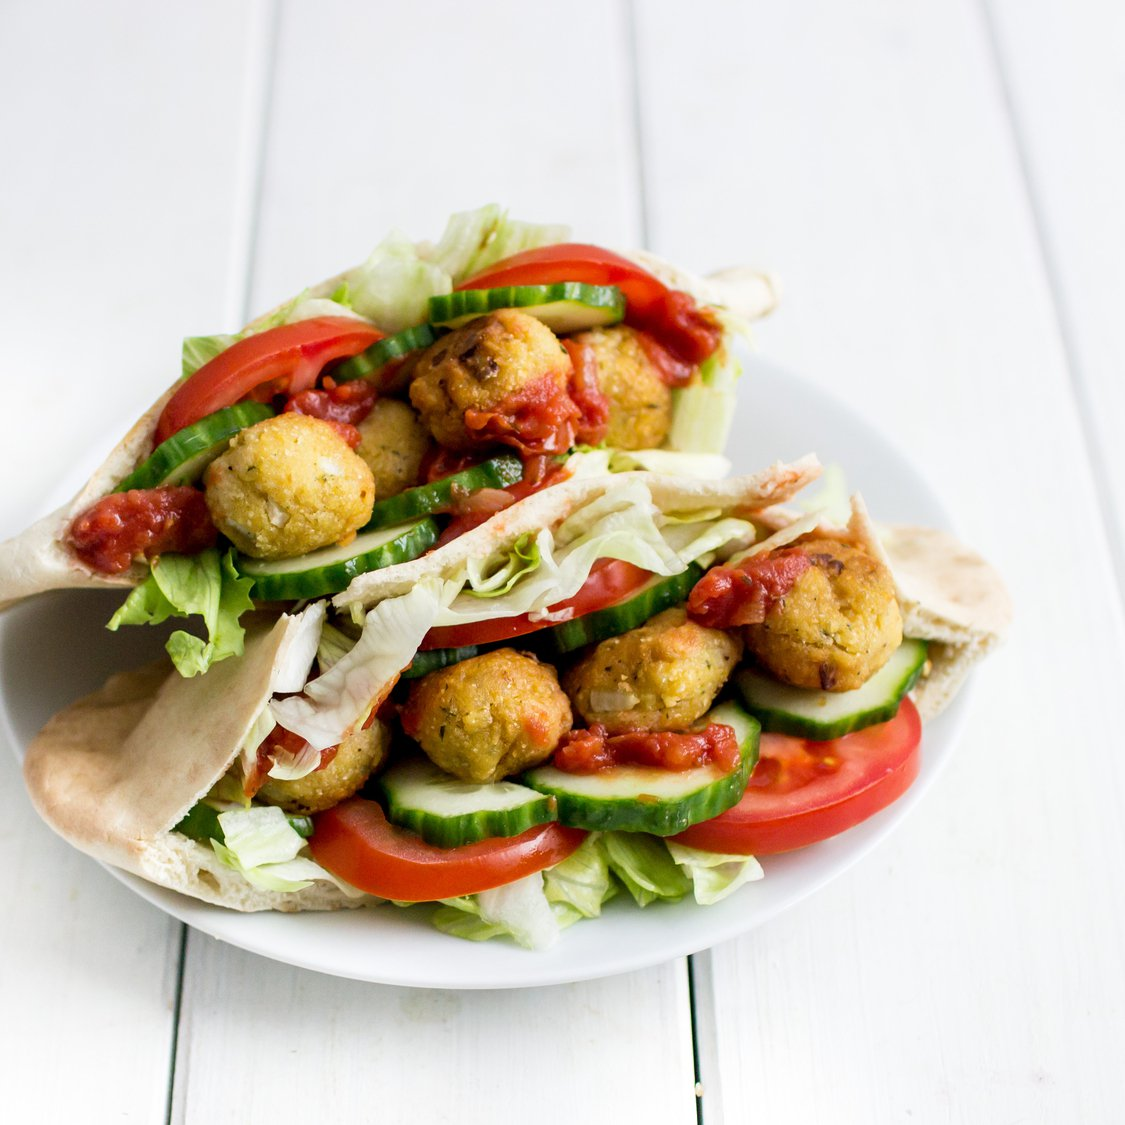 Pita mit Kichererbsen-Falafel